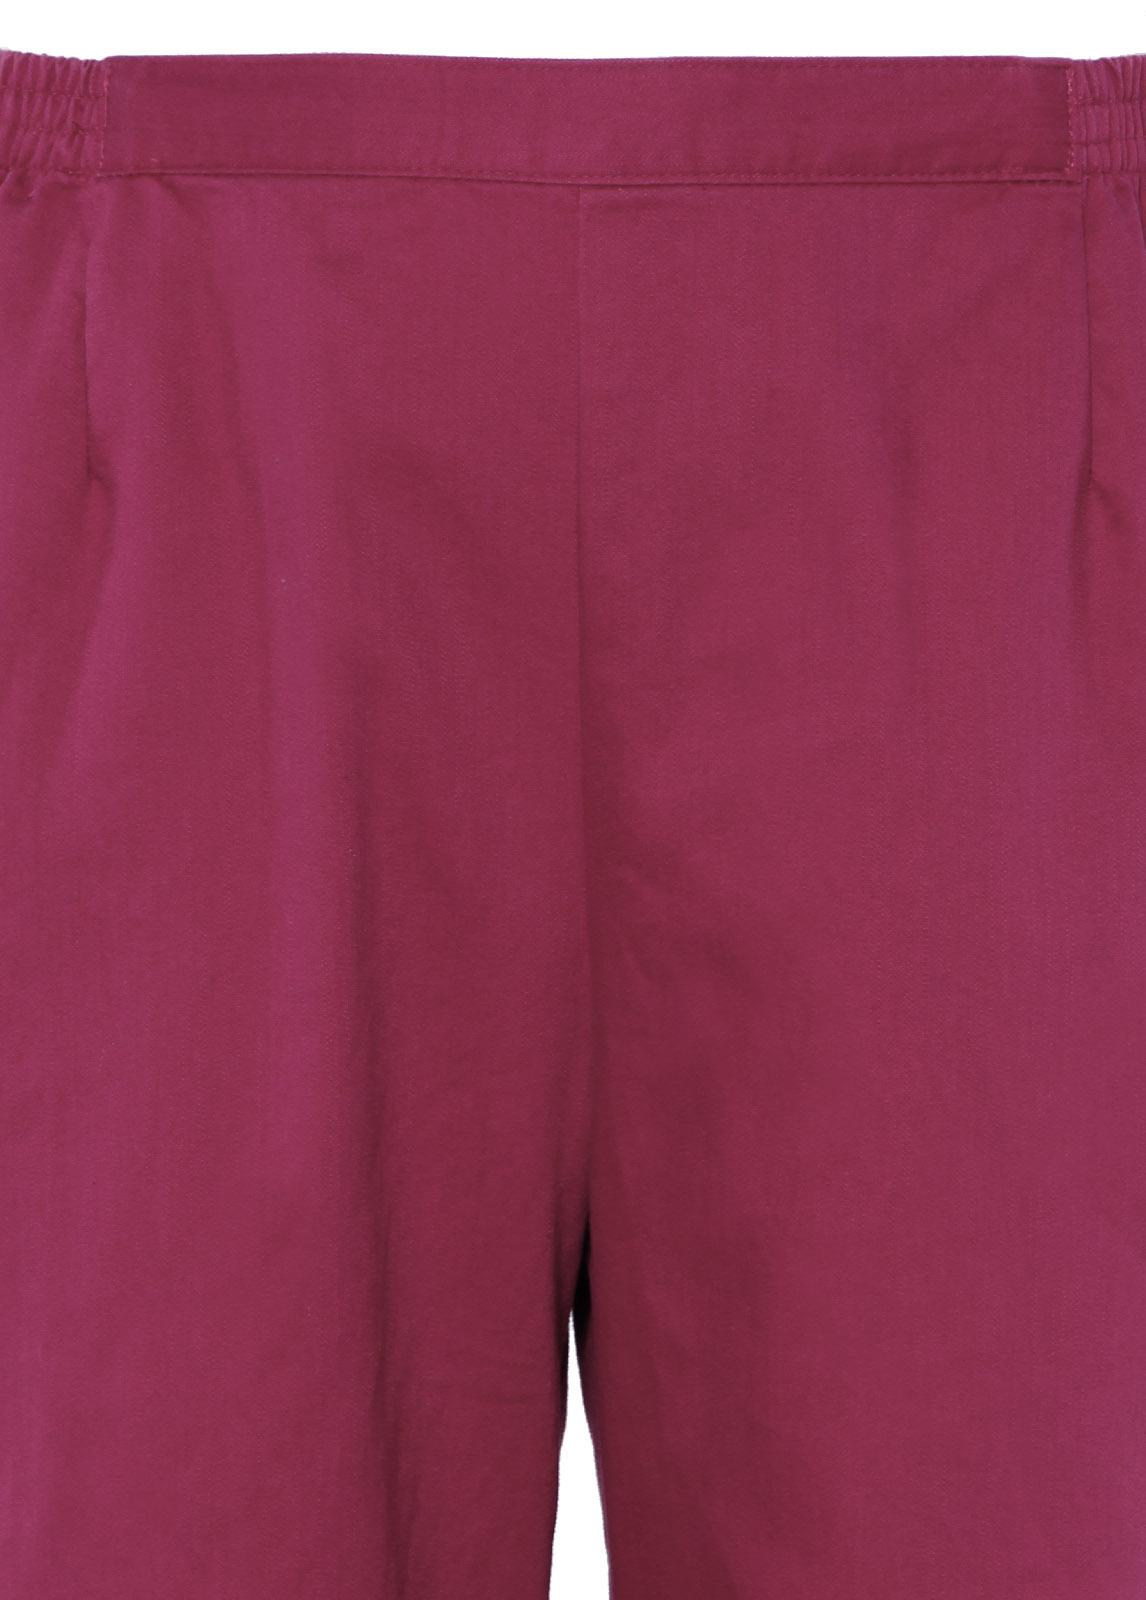 Simple High Waist Elastic Skinny Jeans Cotton Denim Pantsin Jeans From Women